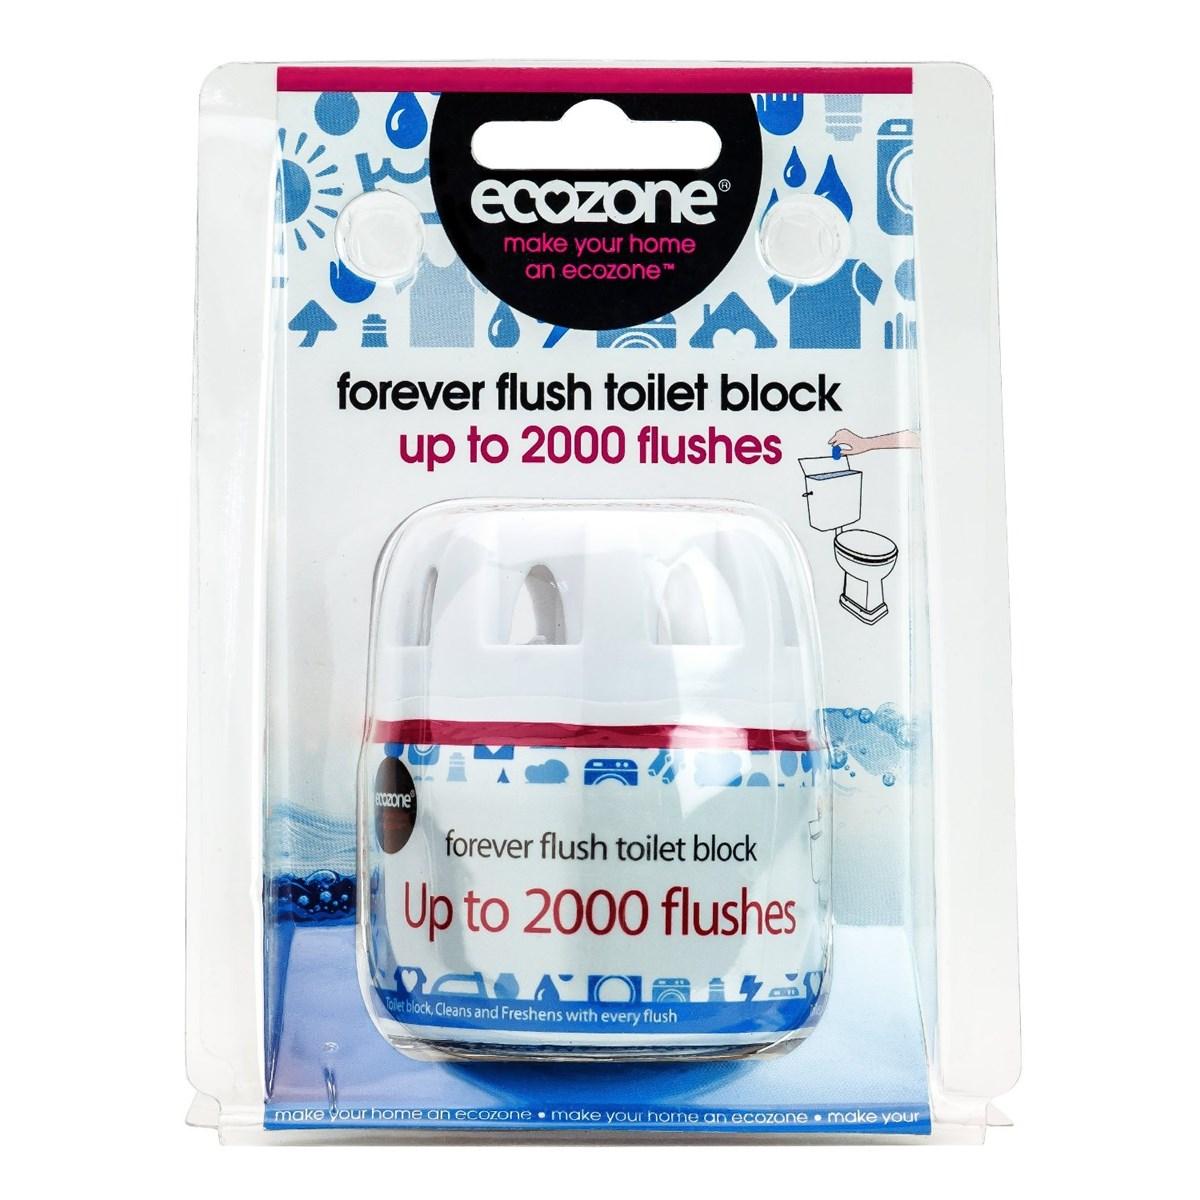 Ecozone Forever Flush Toilet Block